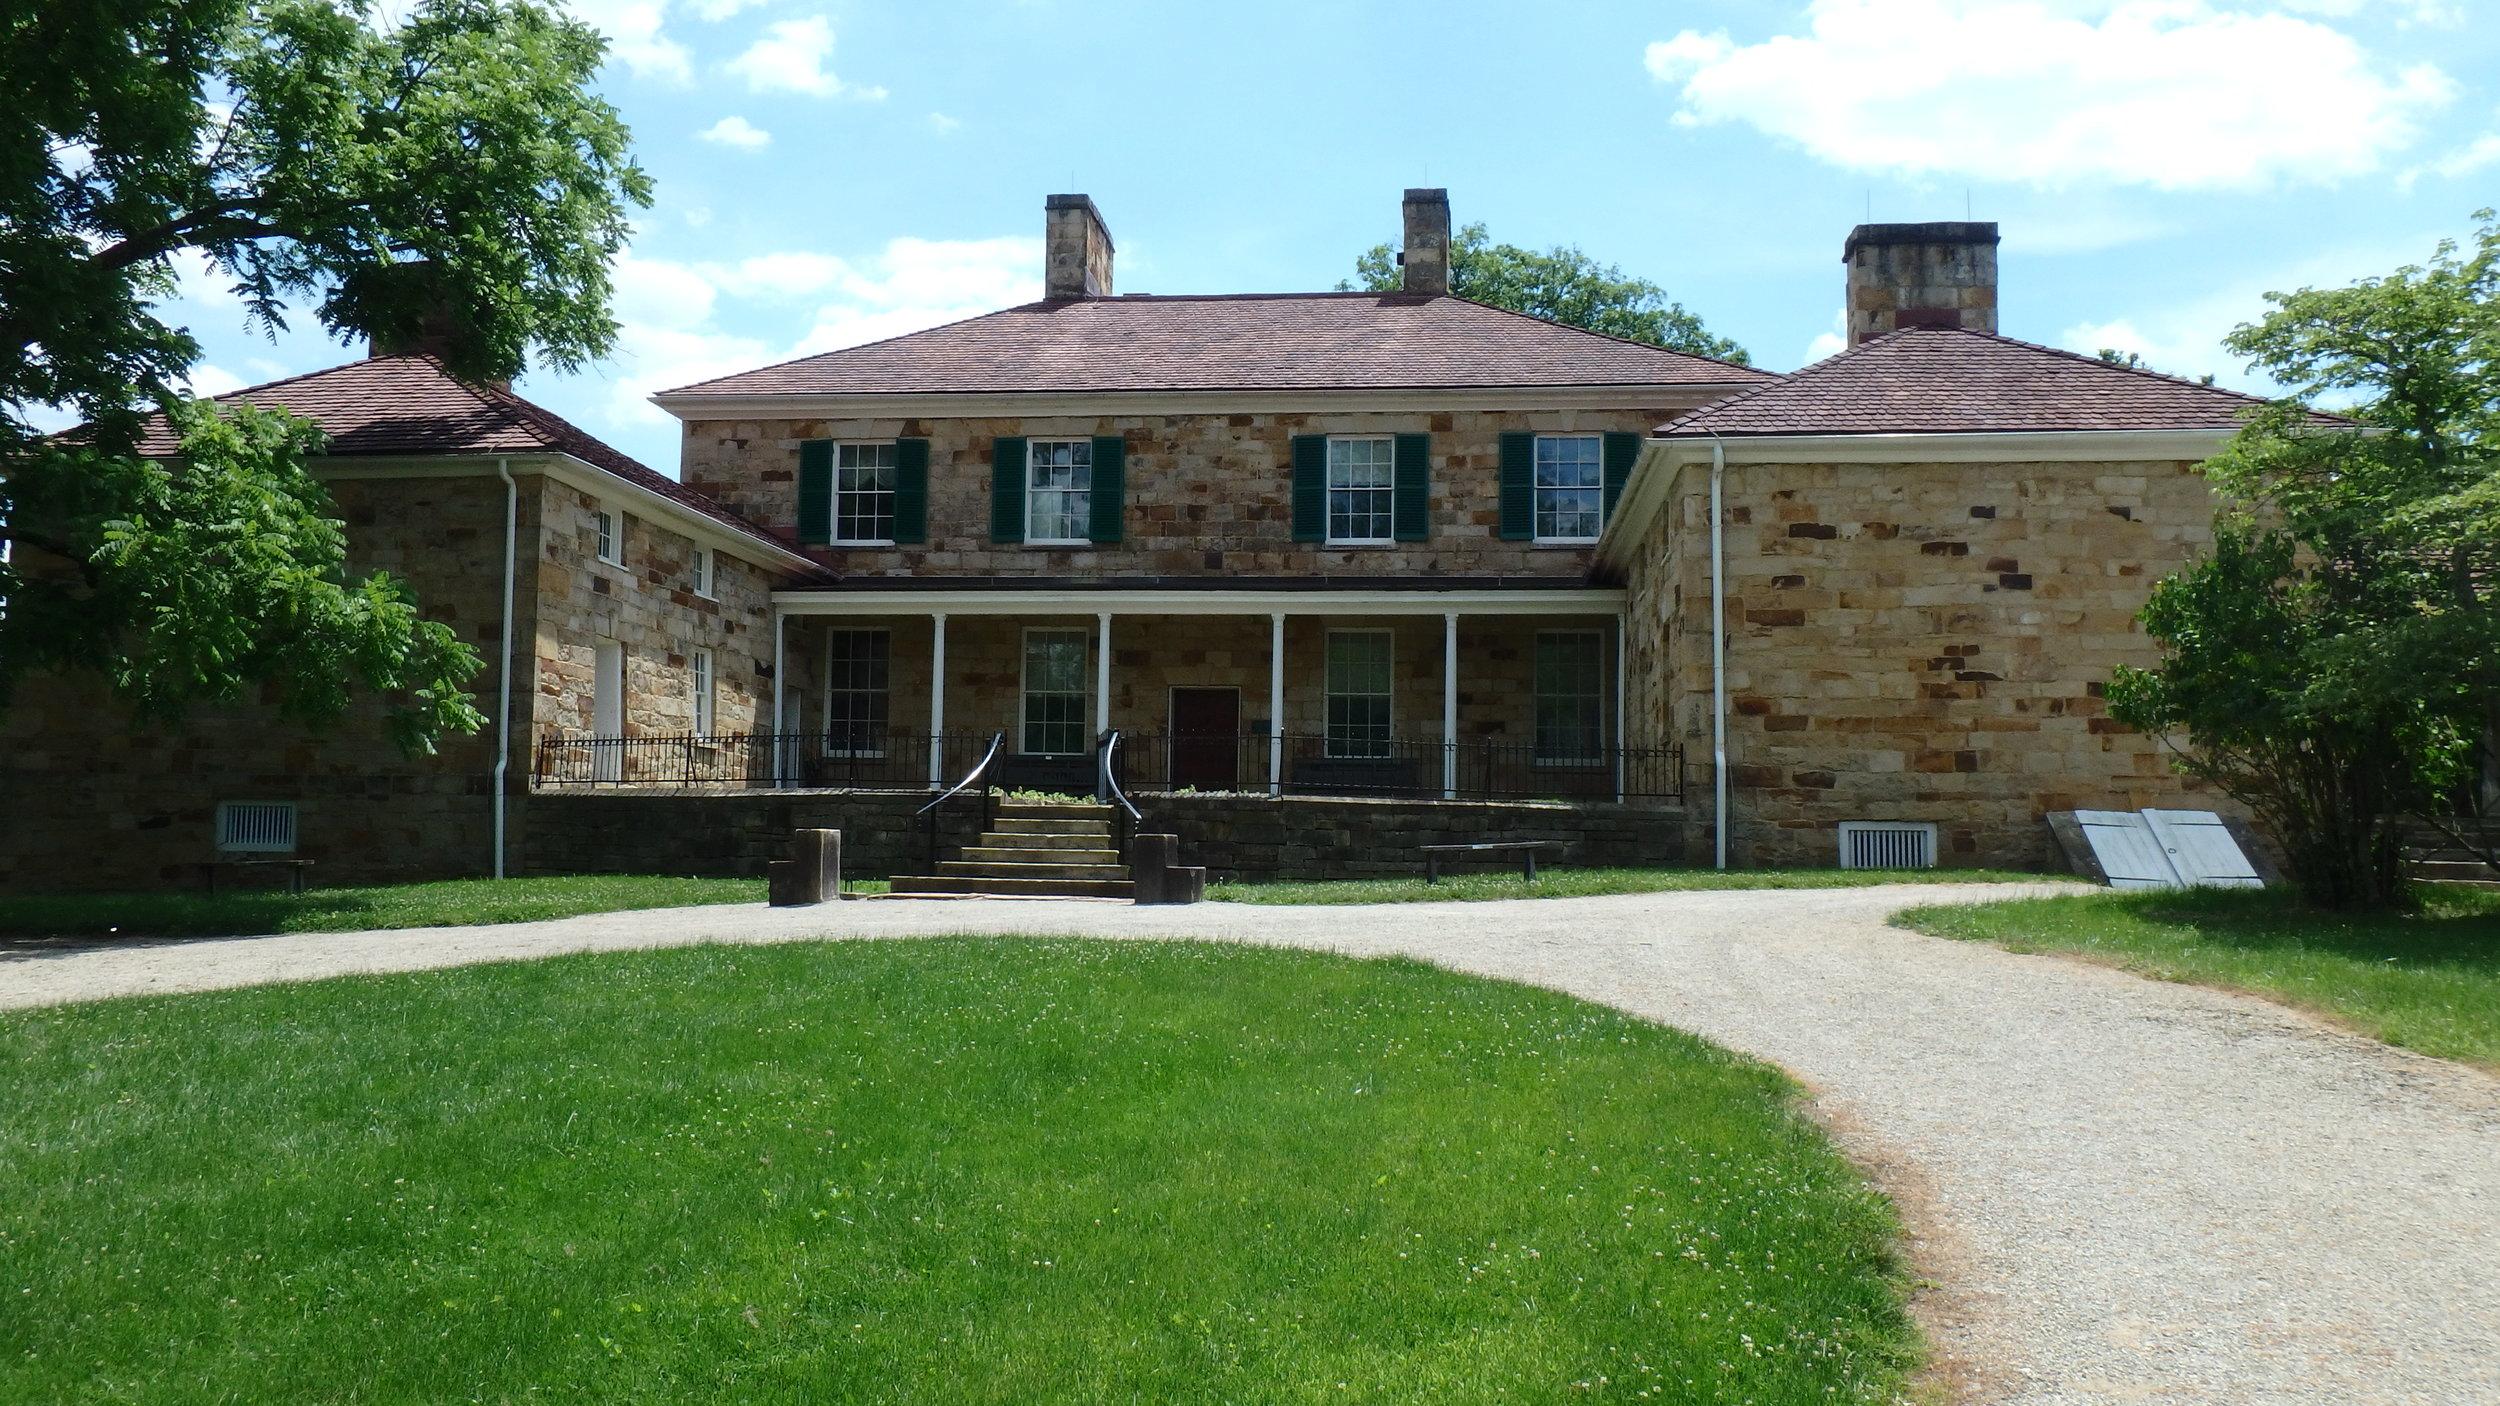 Adena Mansion, Chillicothe Ohio